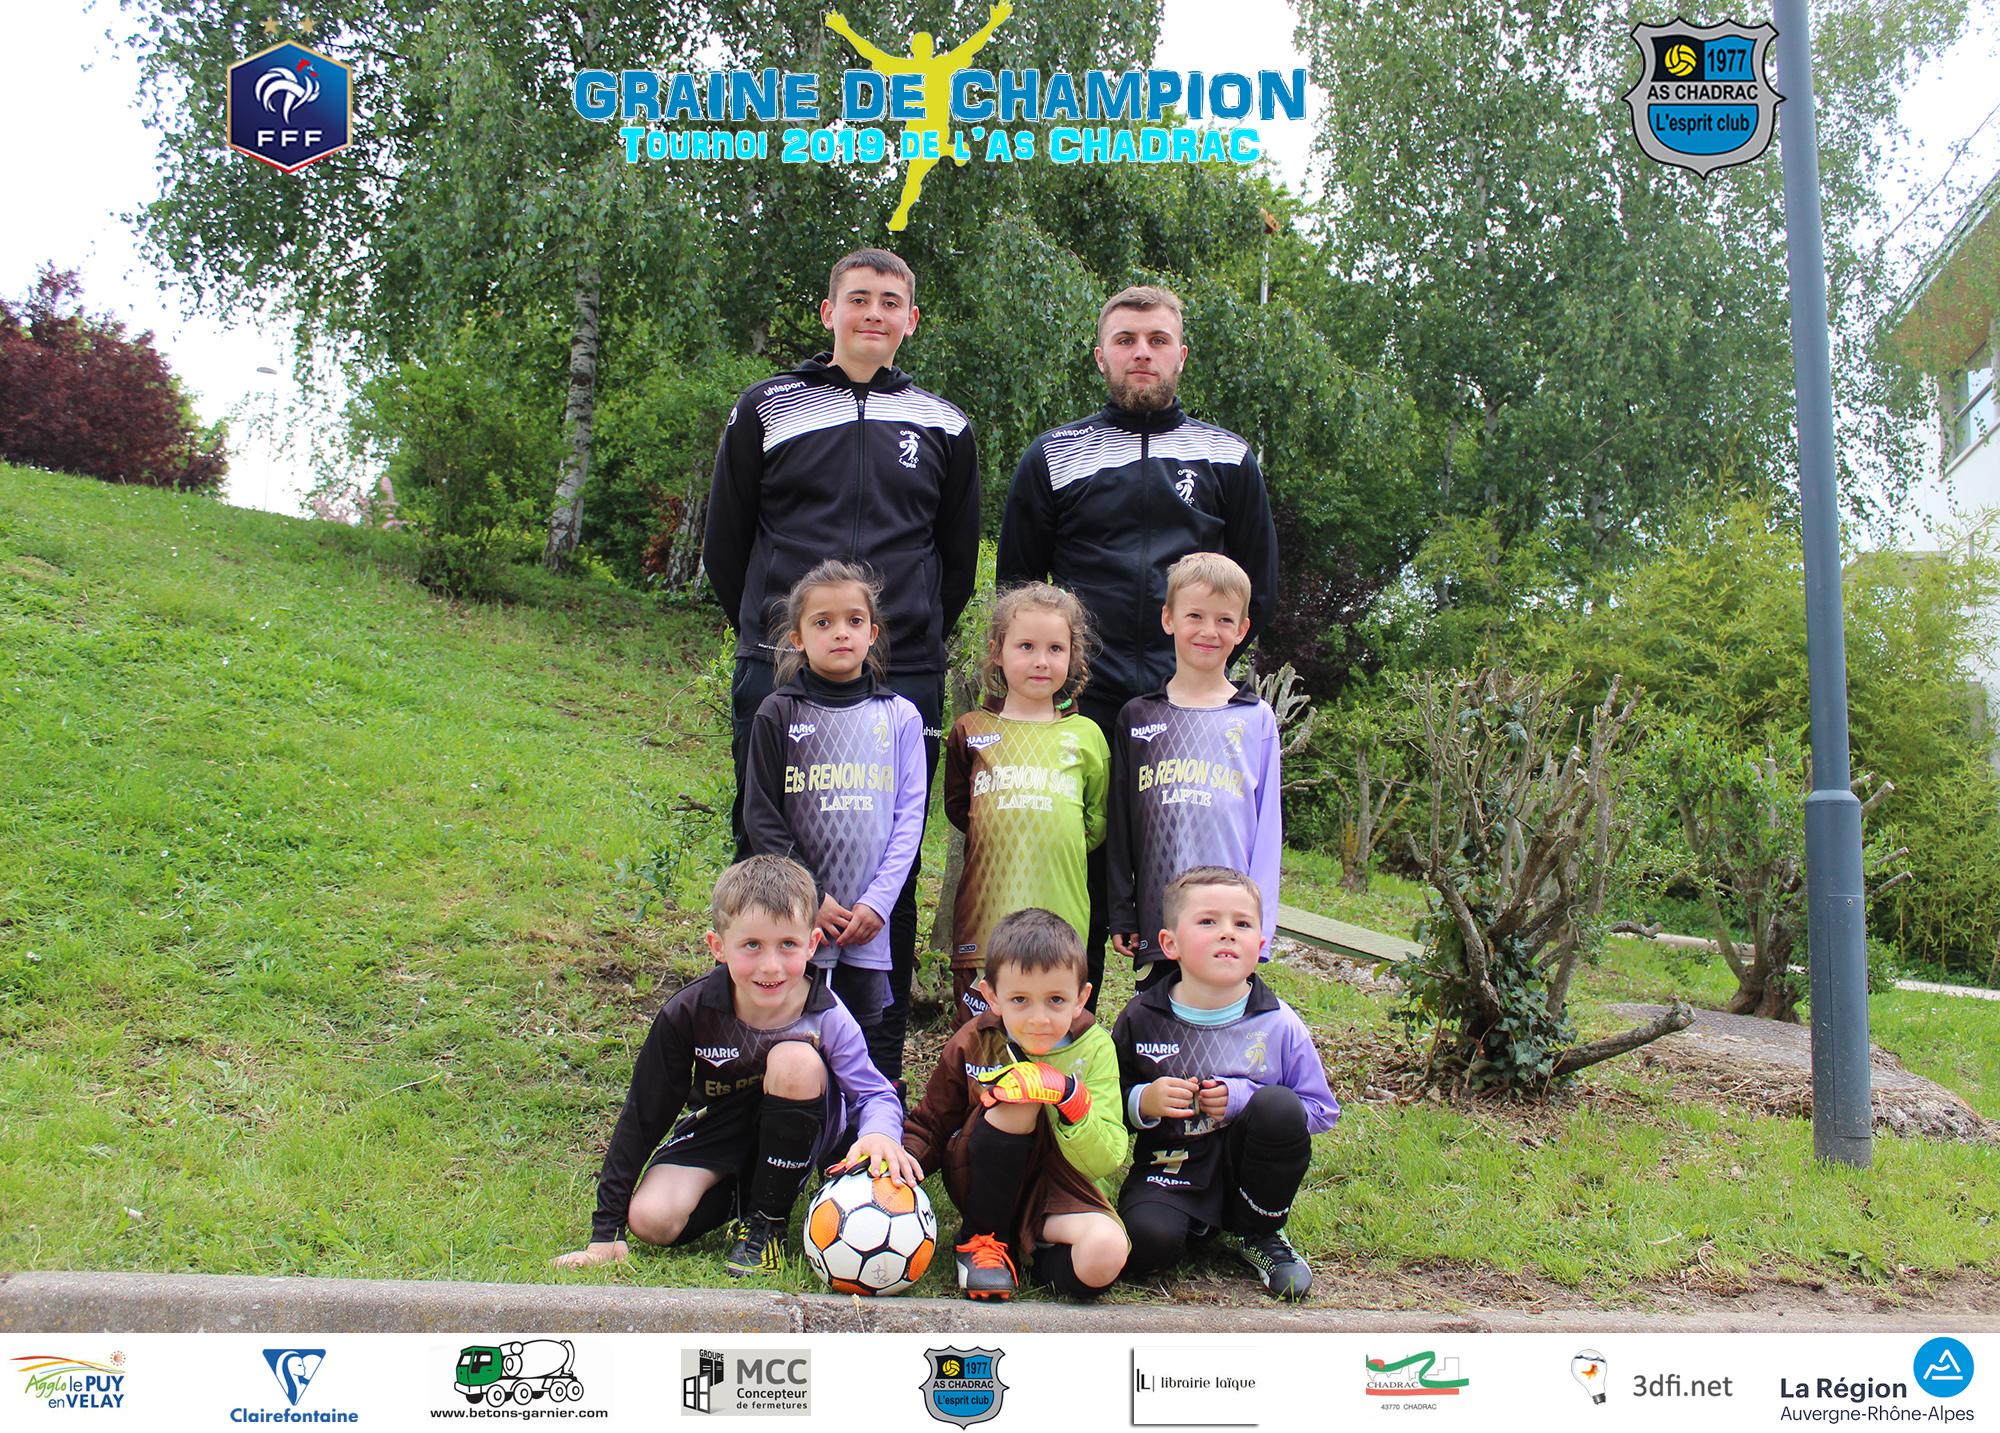 Tournoi graine de champion 2019 equipe u7 u9